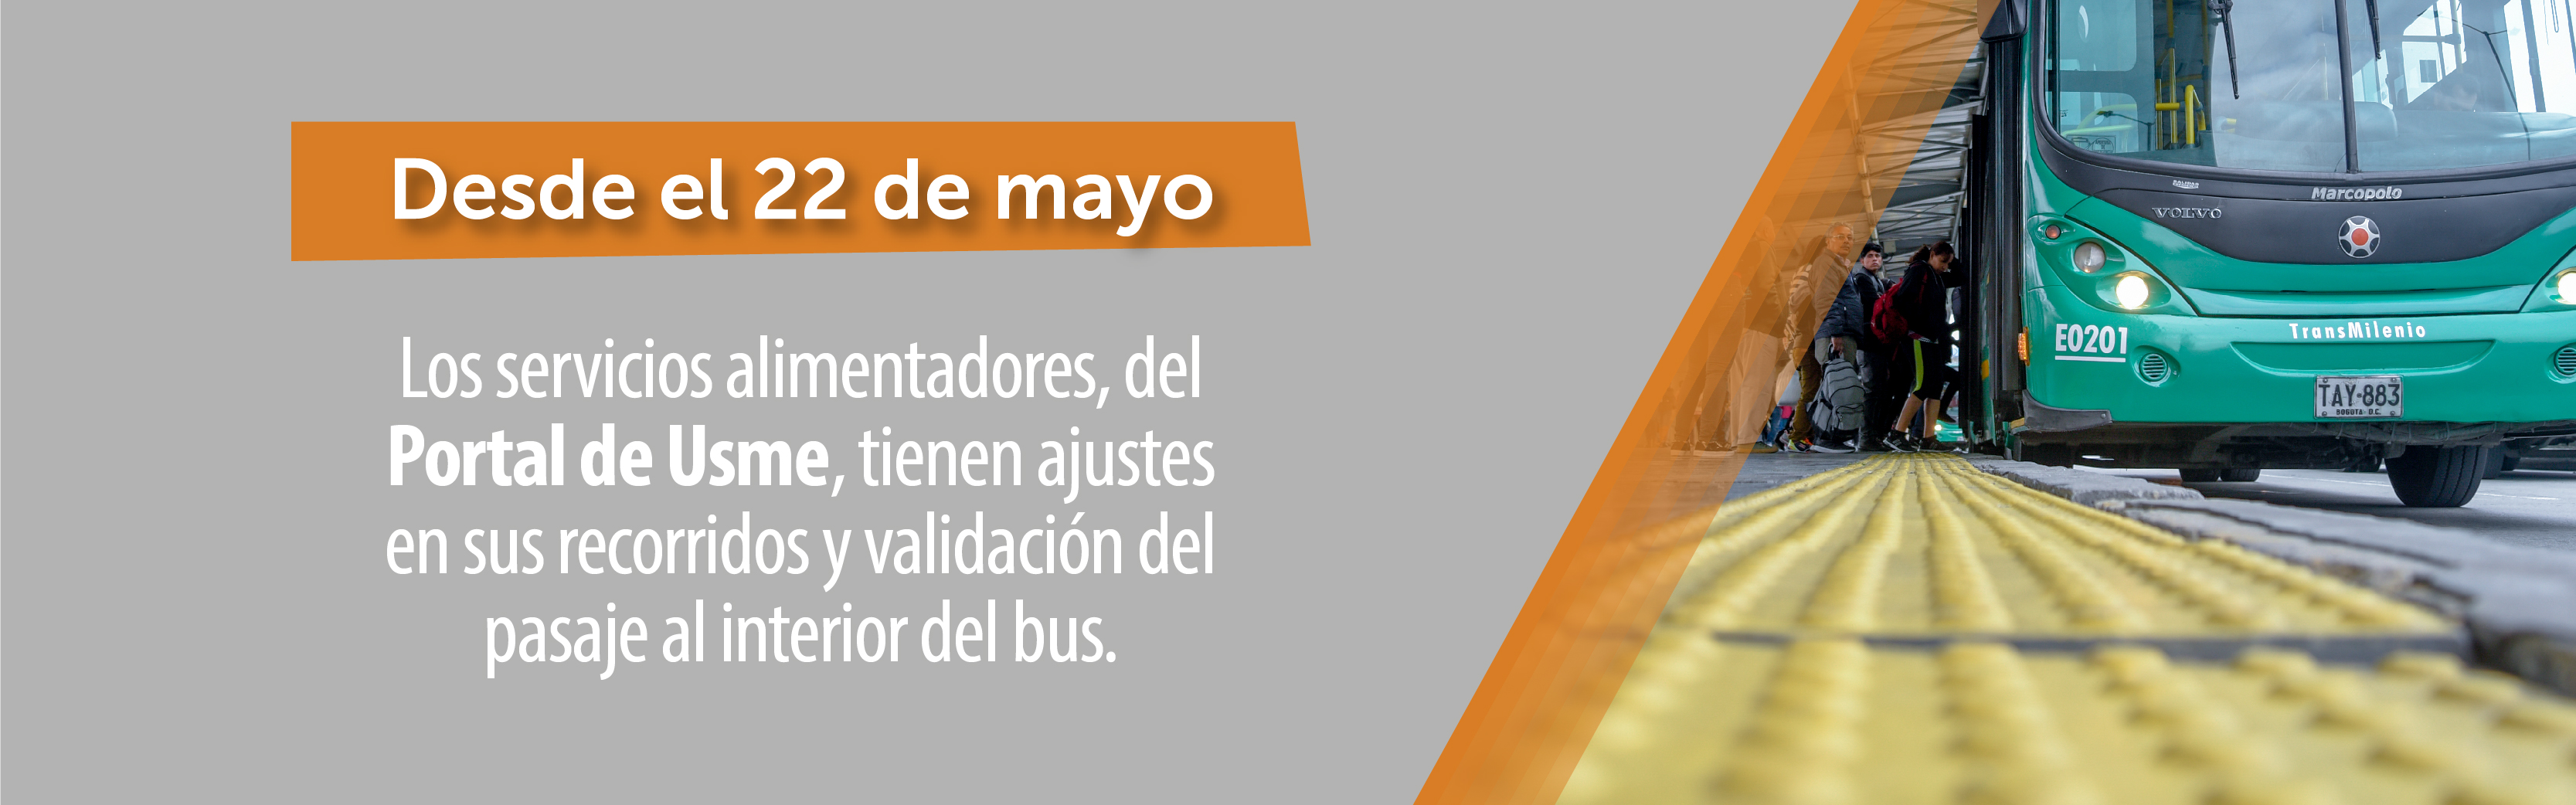 TransMilenio completa primer lote de 483 buses eléctricos para Bogotá